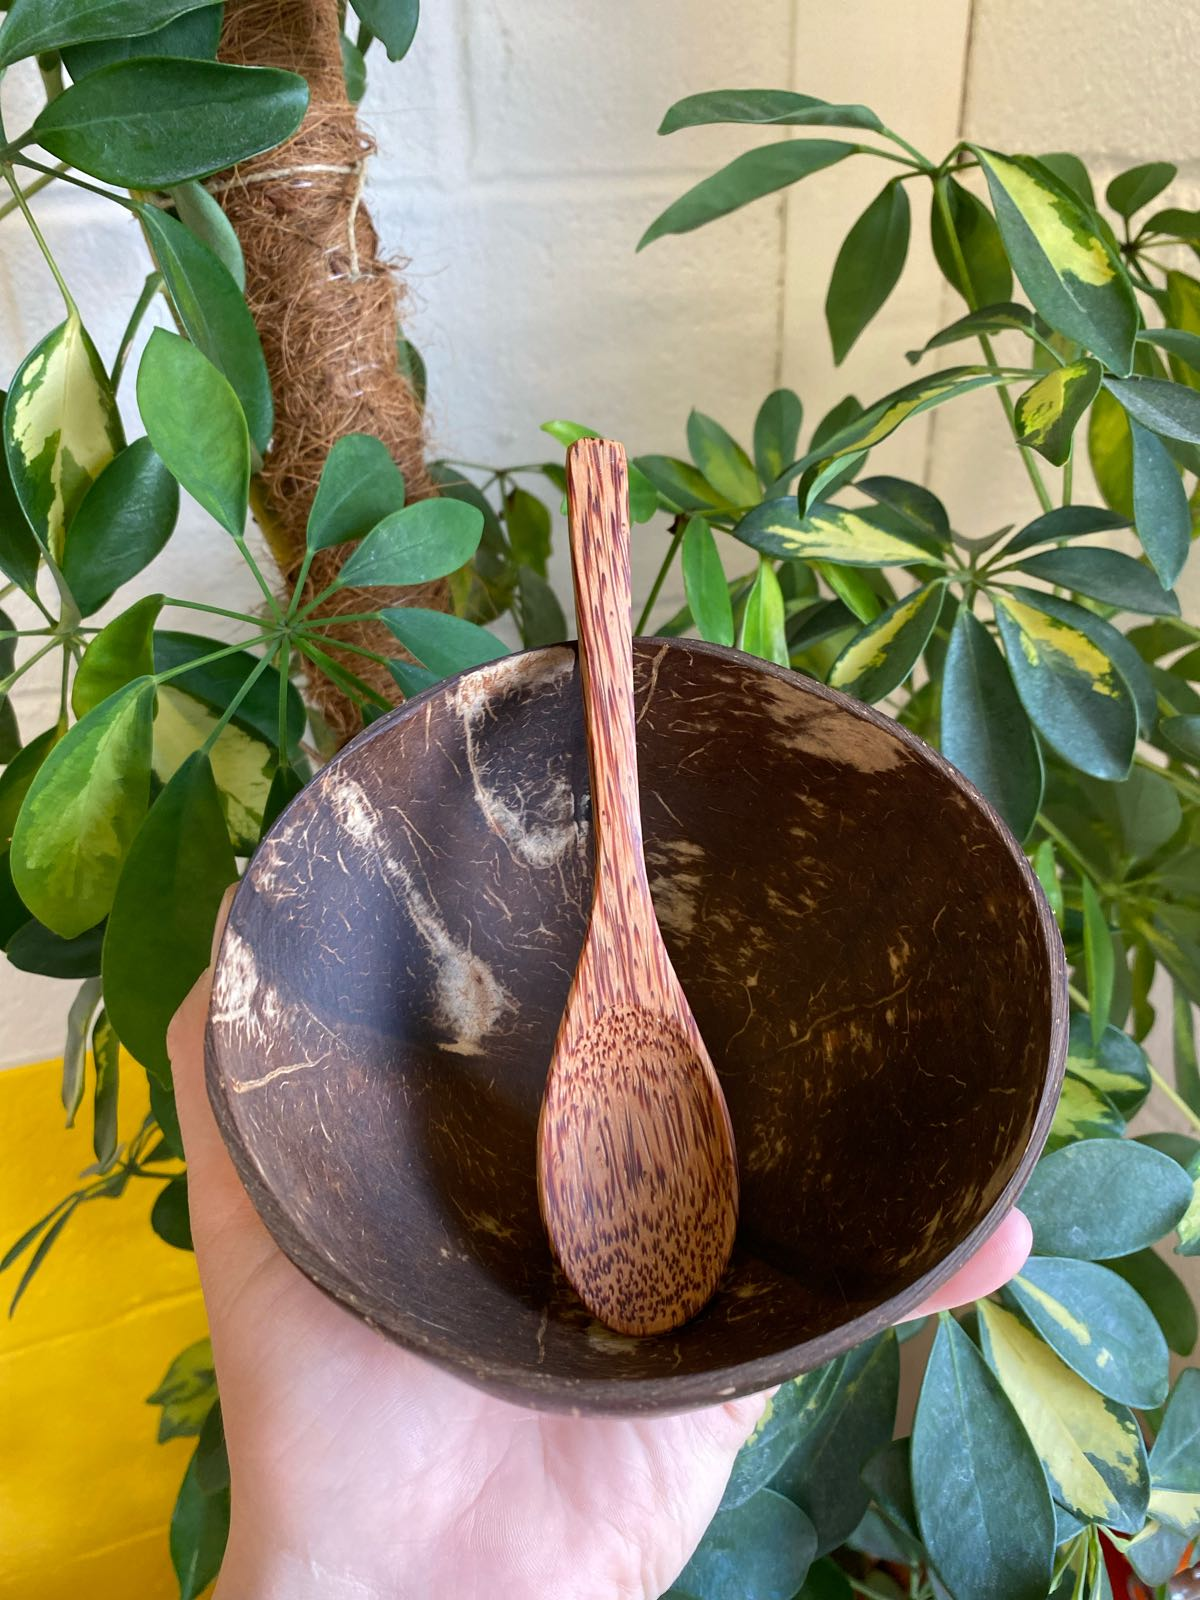 Coconut Spoon | Plastic Phobia